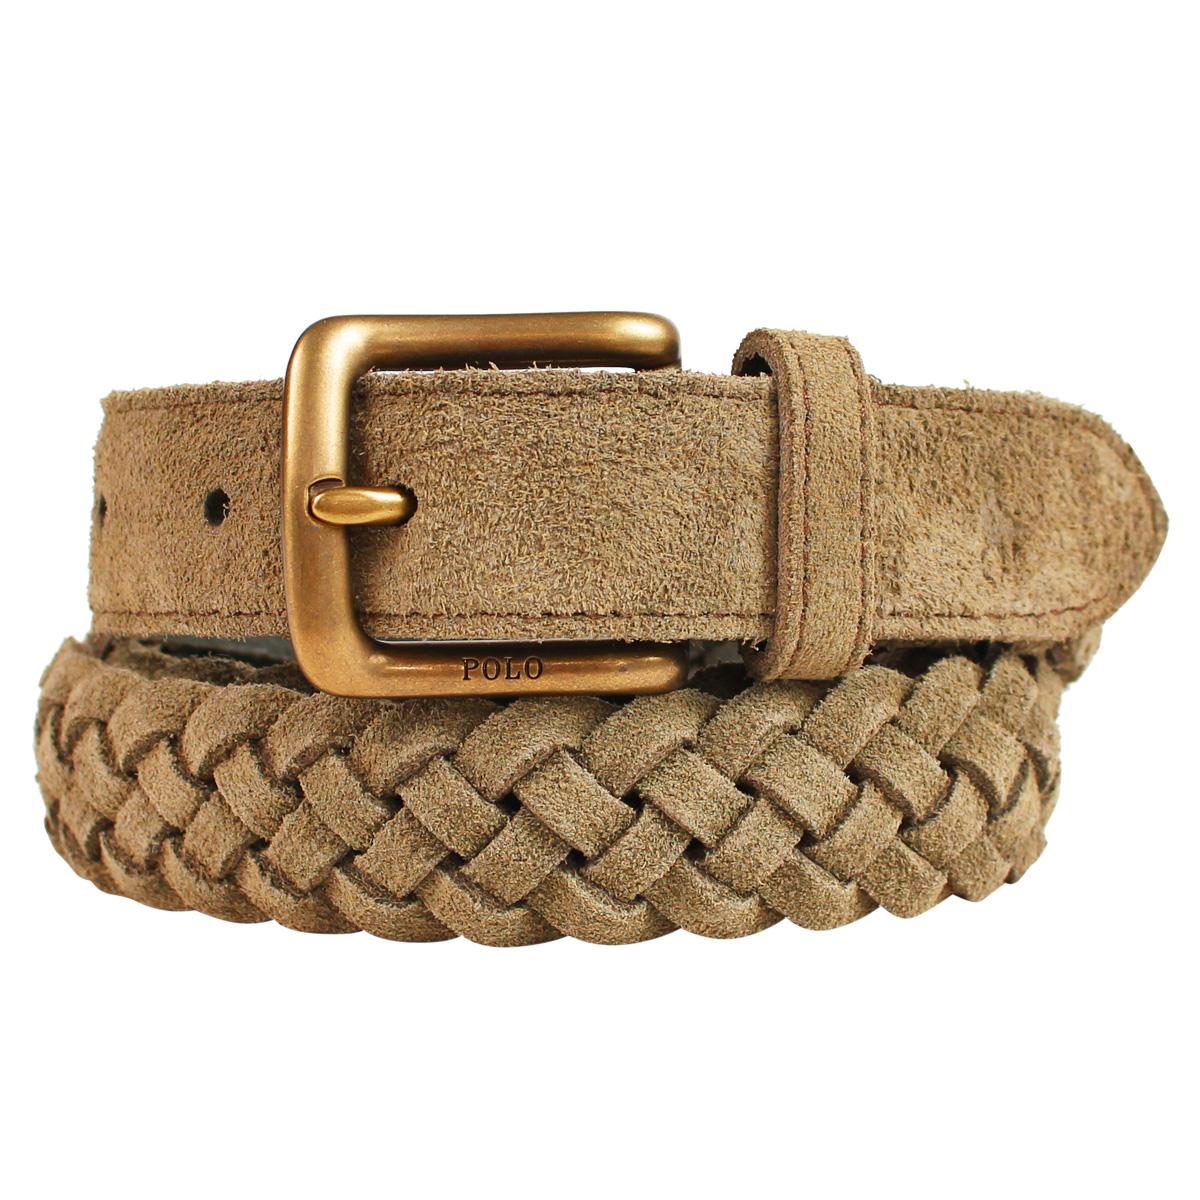 71dd5b84e085a POLO RALPH LAUREN BRAIDED SUEDE BELT polo Ralph Lauren belt leather belt men  genuine leather brown 405710683002  1 15 Shinnyu load   191